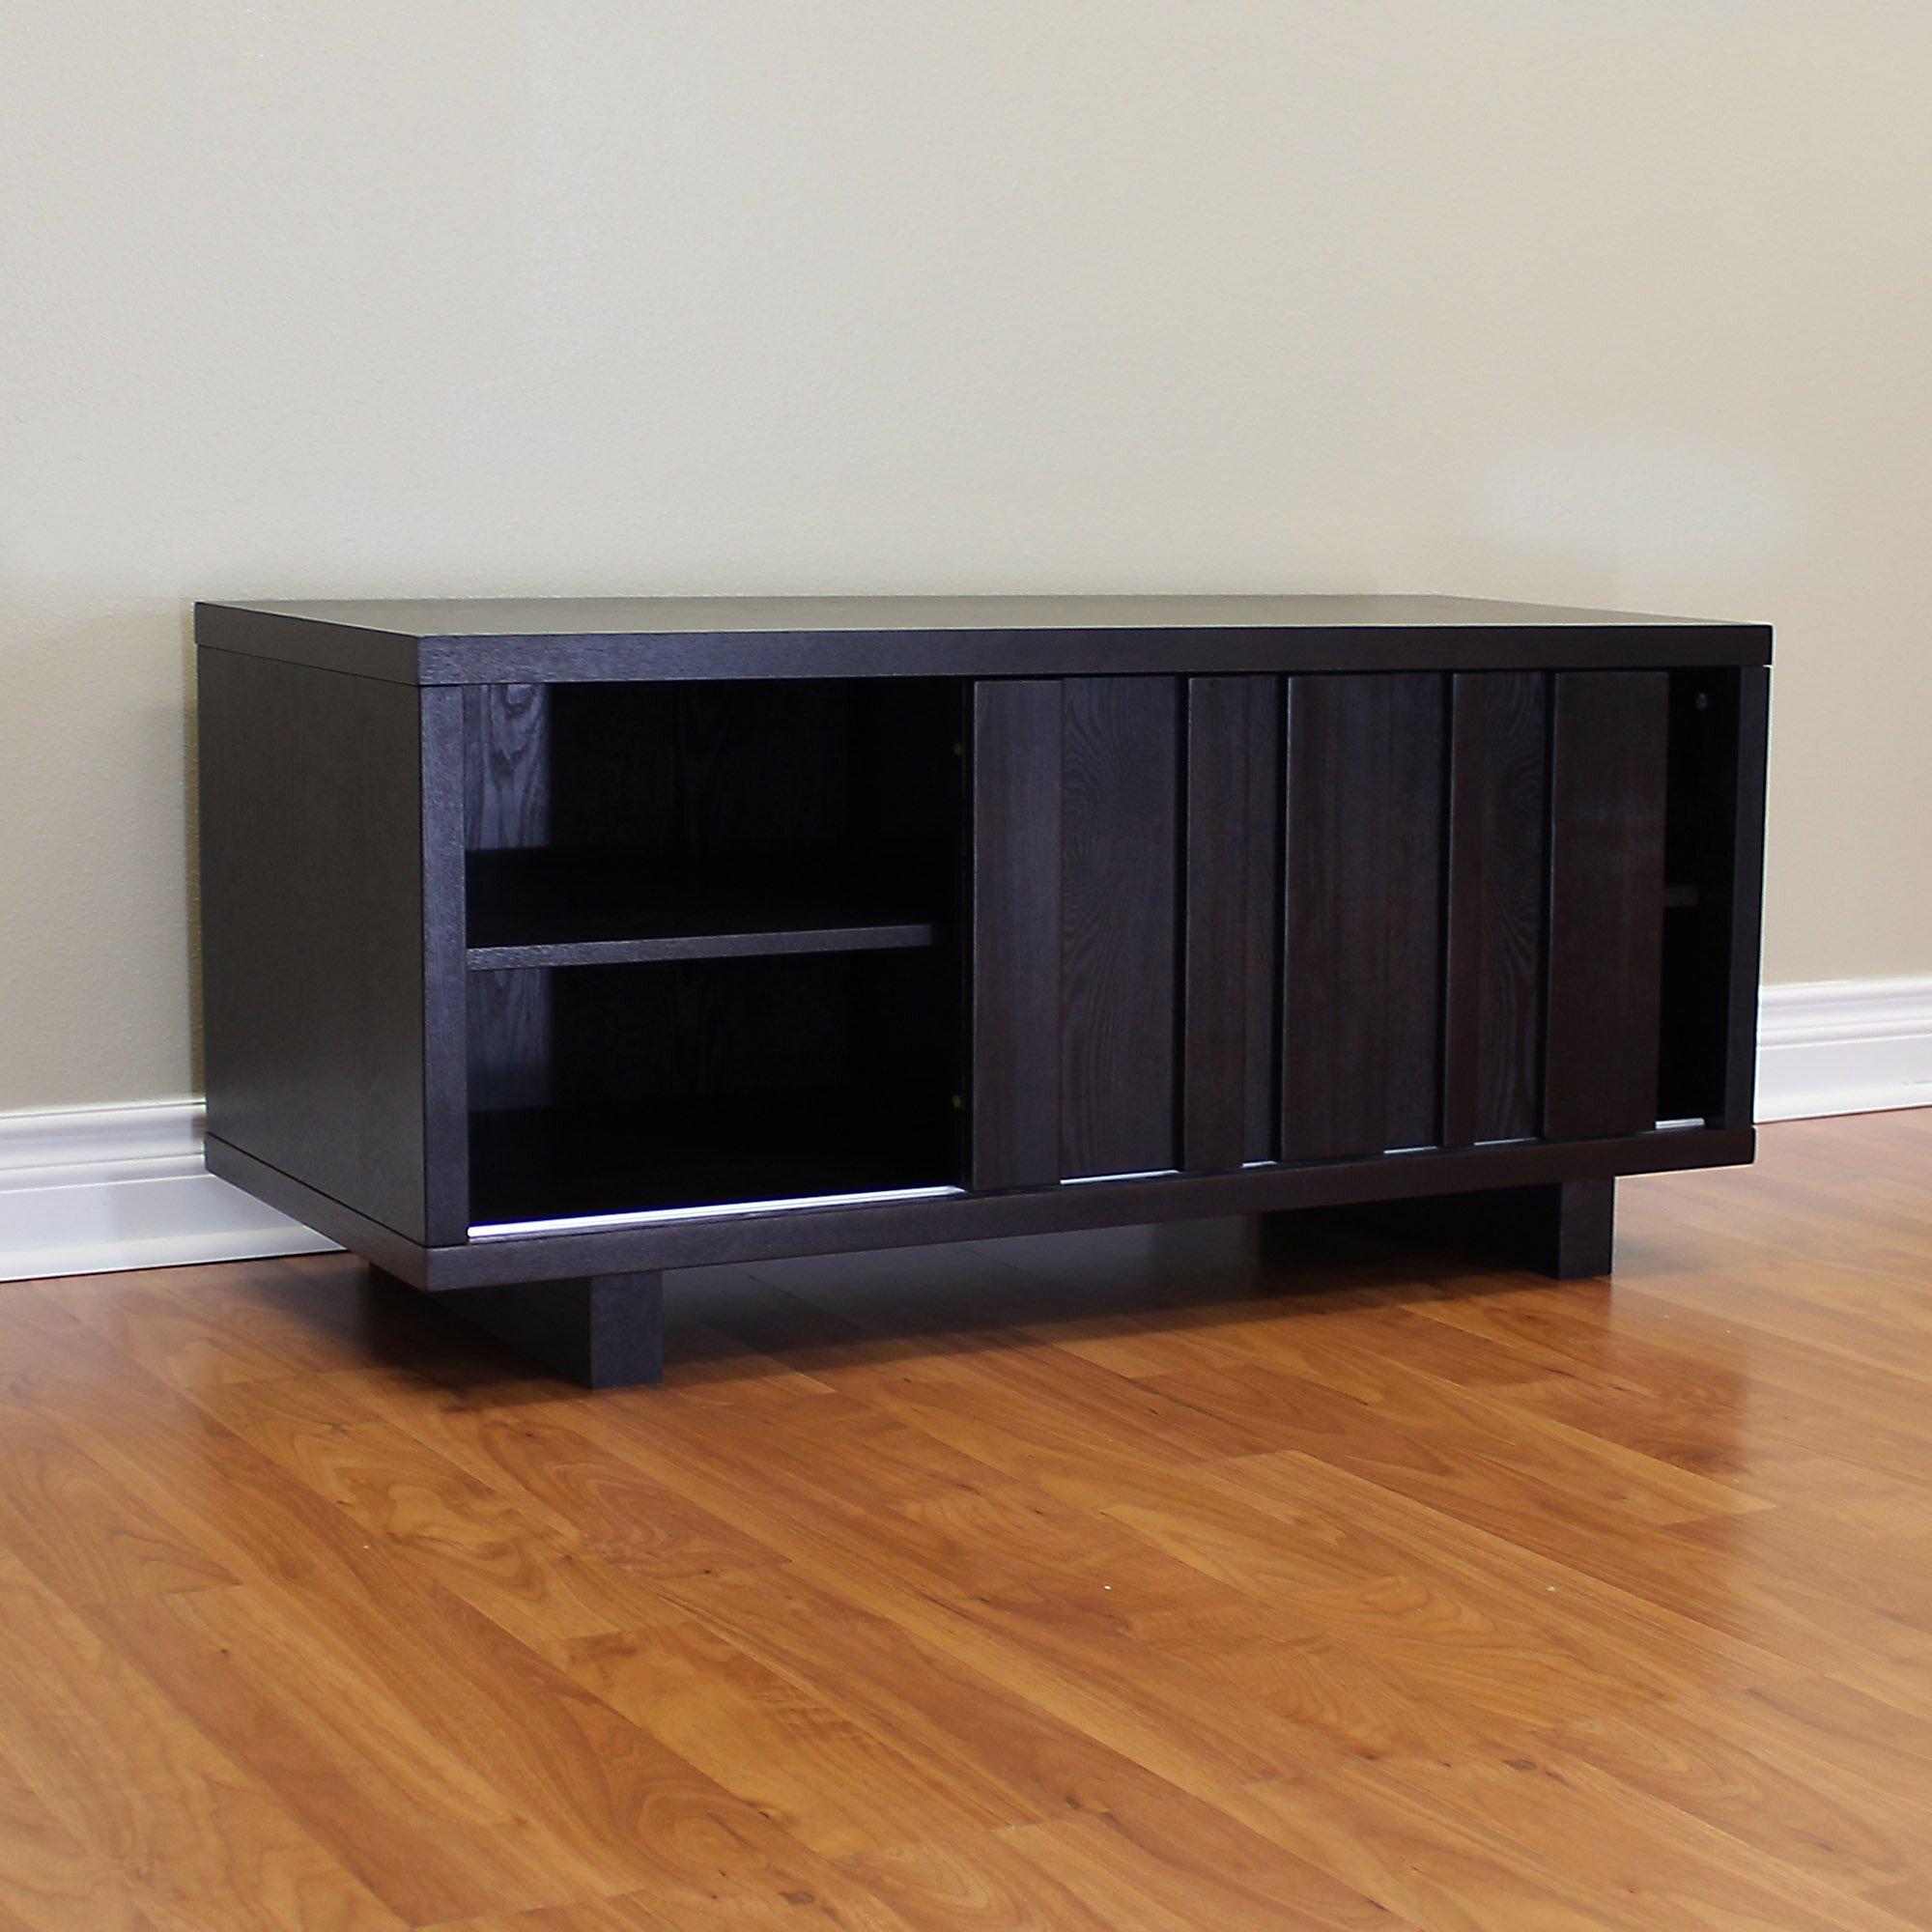 conrad wood storage bedroom bench wayfair. Black Bedroom Furniture Sets. Home Design Ideas